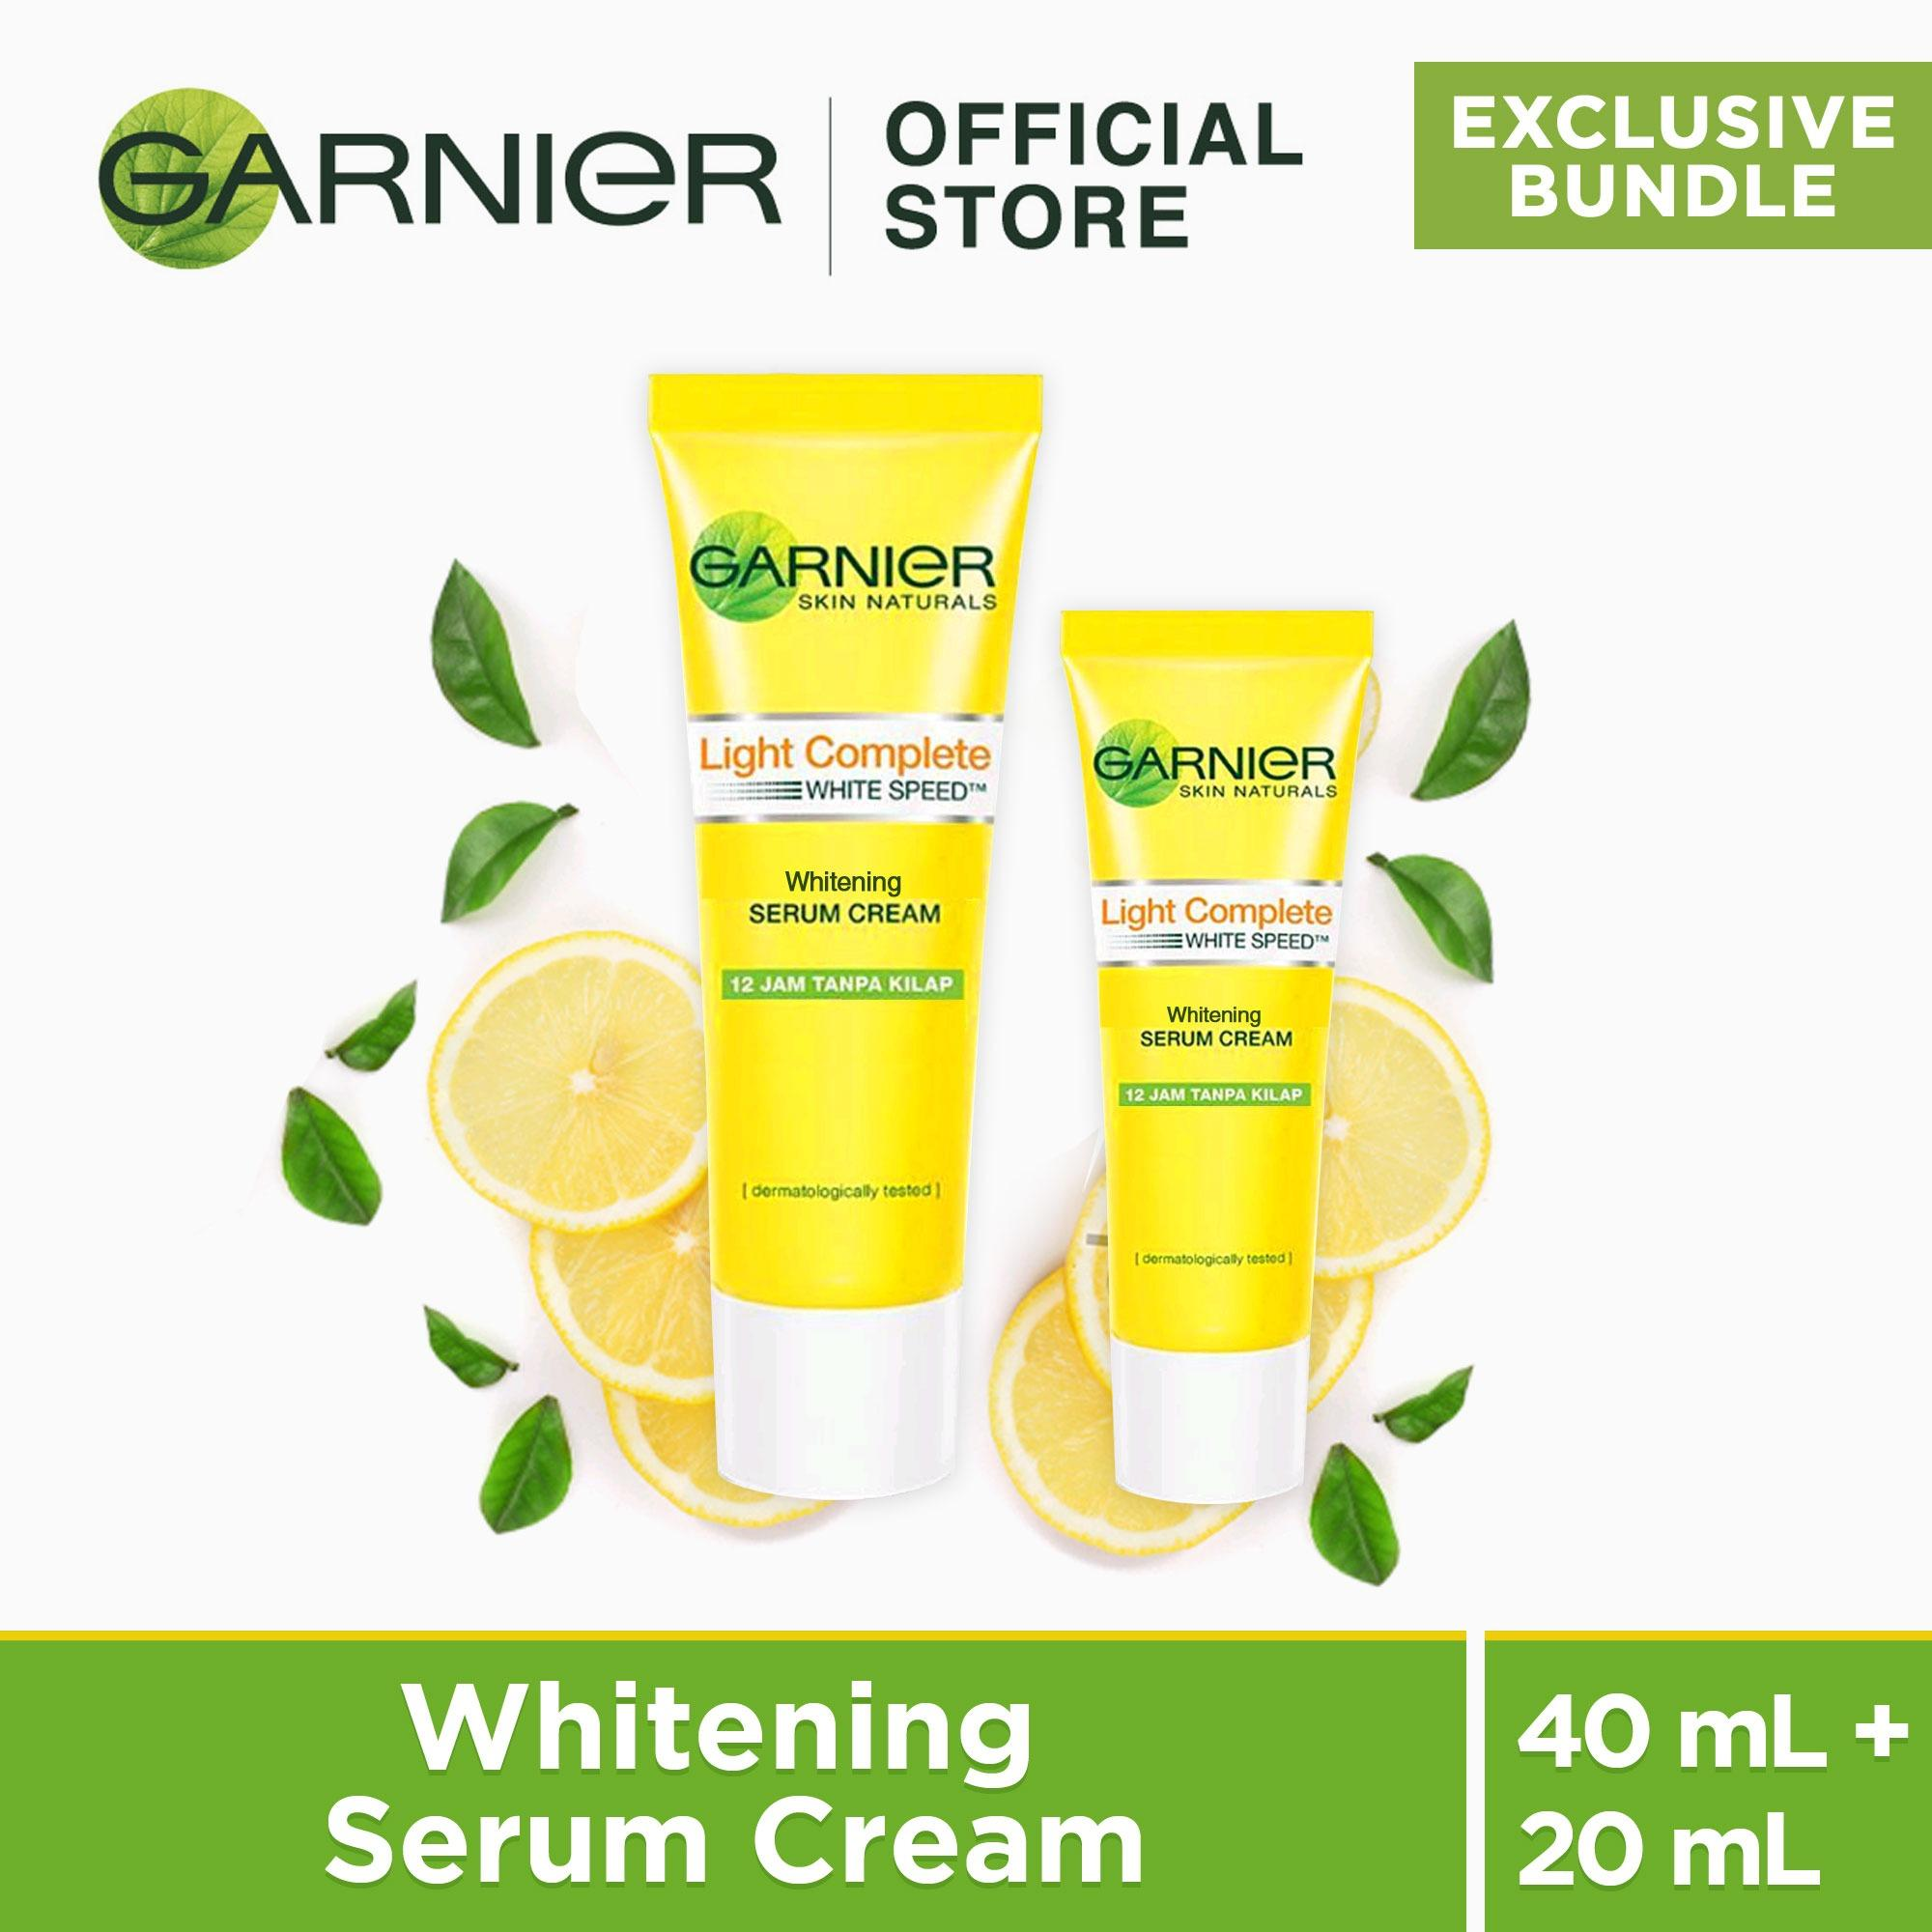 Promo Garnier Light Complete Sachet Termurah 2018 White Speed Super Foam 10 100ml Philippines Price List Bb Cream Face Toner 12h Shine Free Whitening Serum